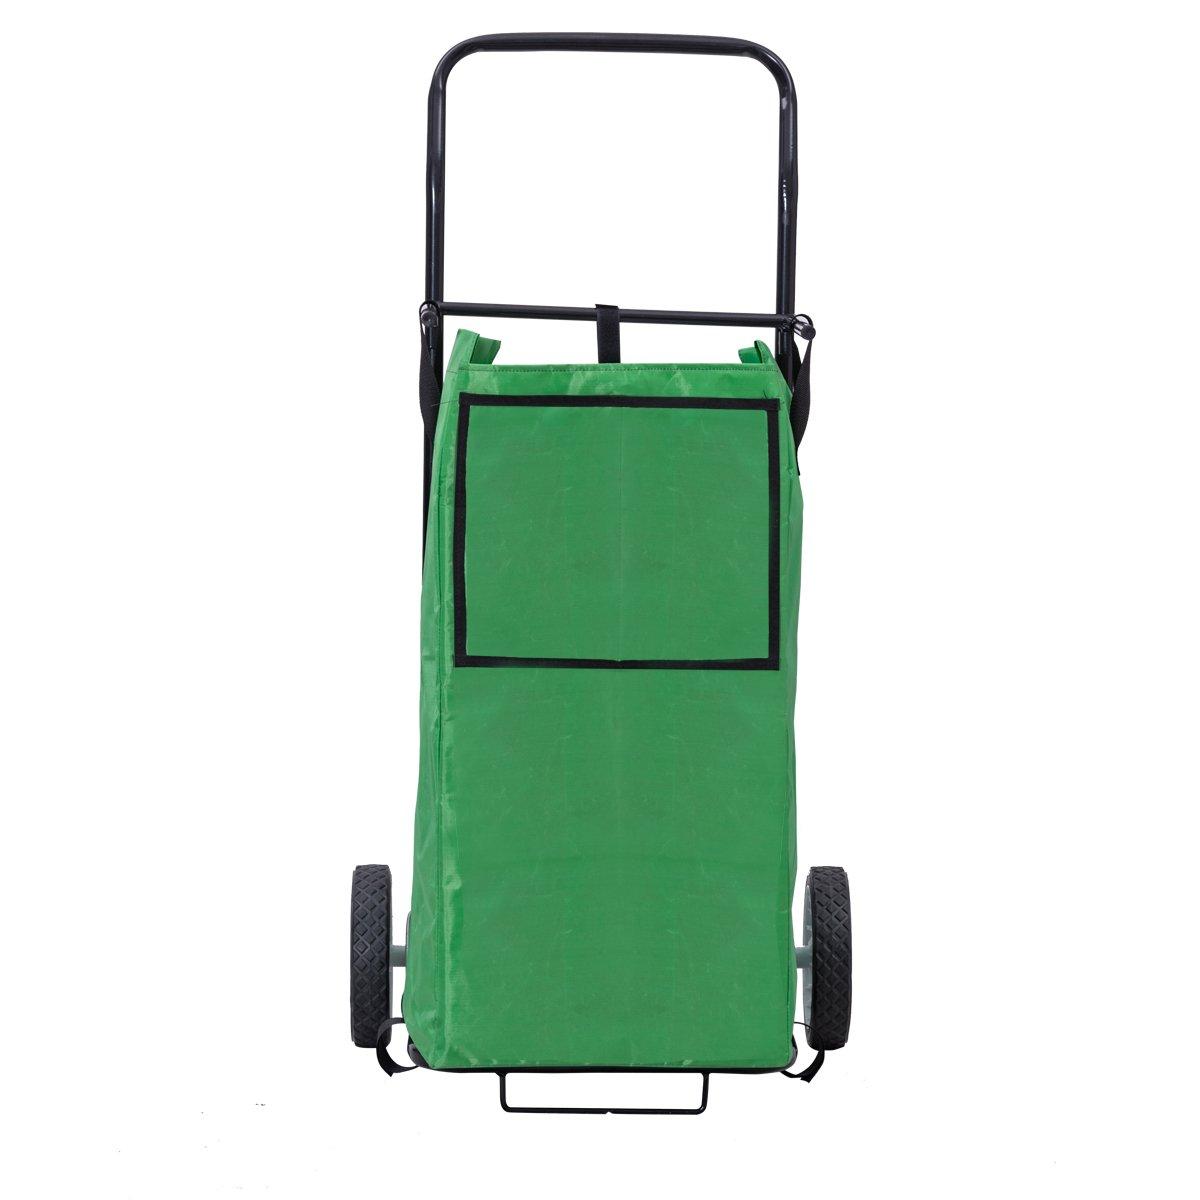 Goplus Portable Gardening Lawn Leaf Bag Detachable Tote Cart Multifunctional Folding Basket w/ Pocket Green by Goplus (Image #9)